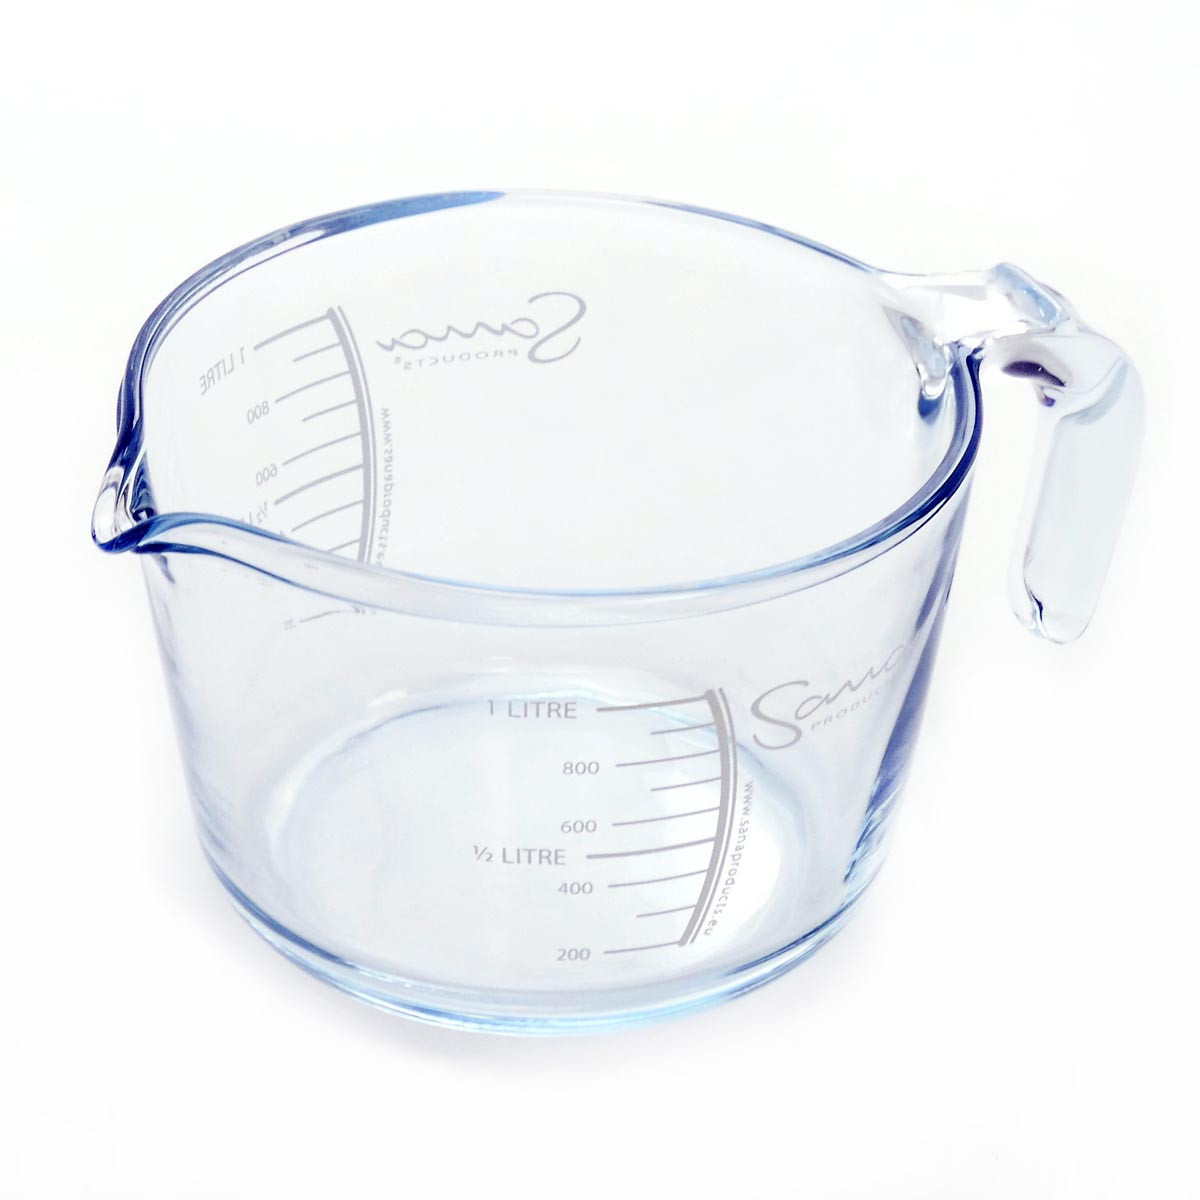 Omega Sana 707 Glass Bowl